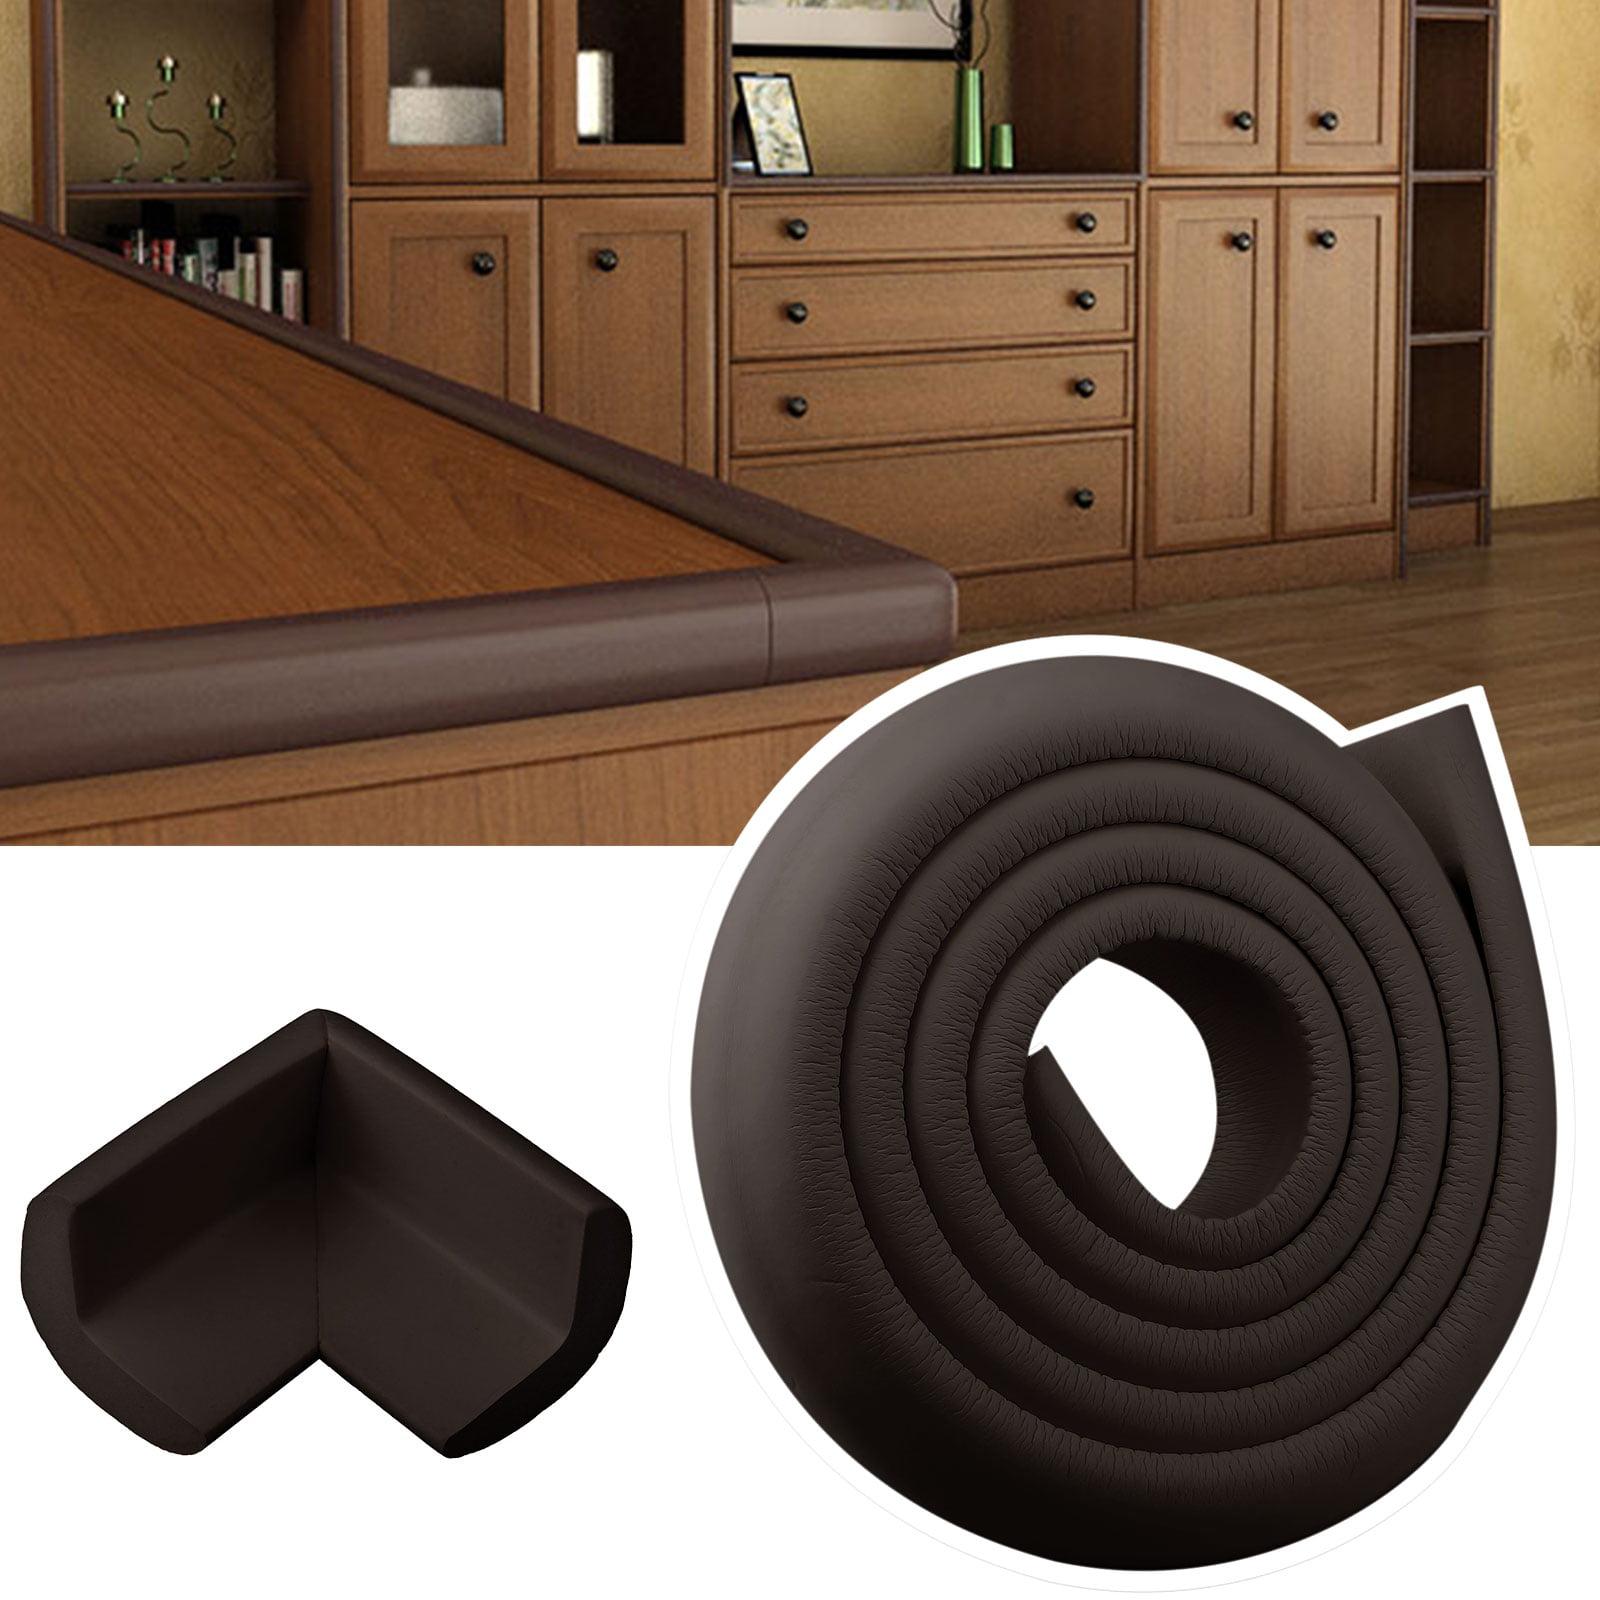 Eeekit Table Desk Edge Corner Cushion